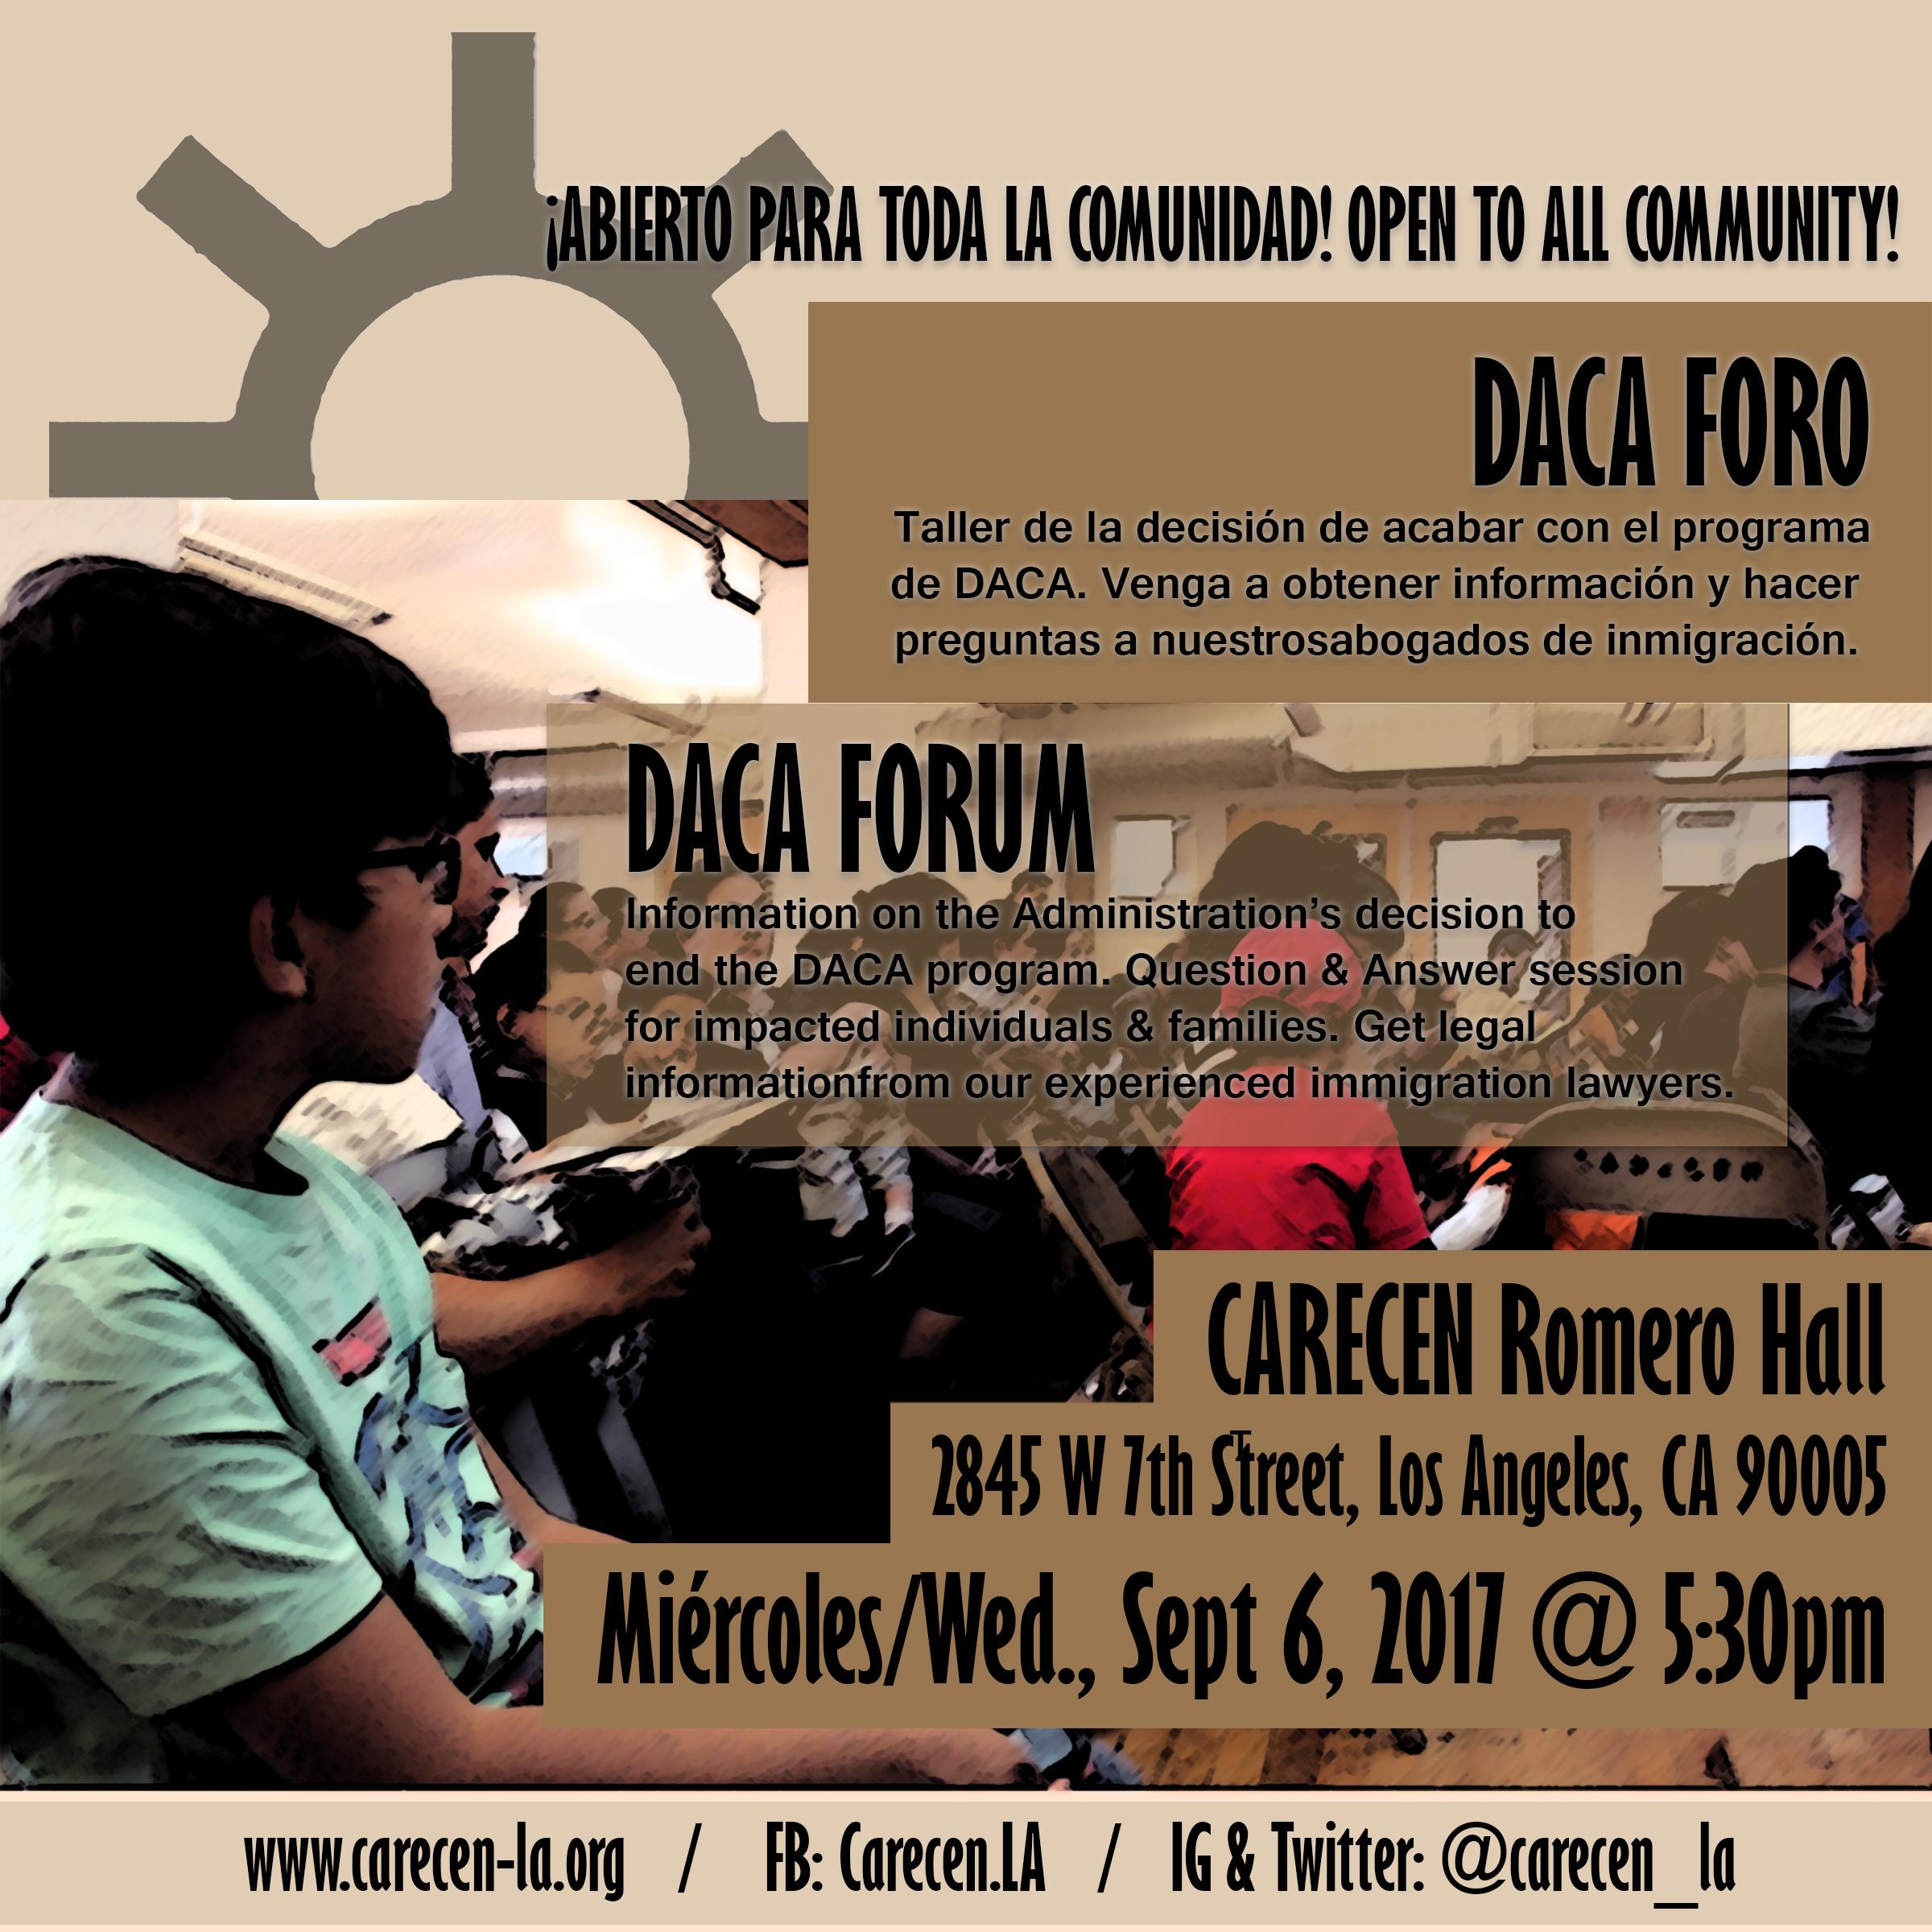 DACA_Flyer2.jpg